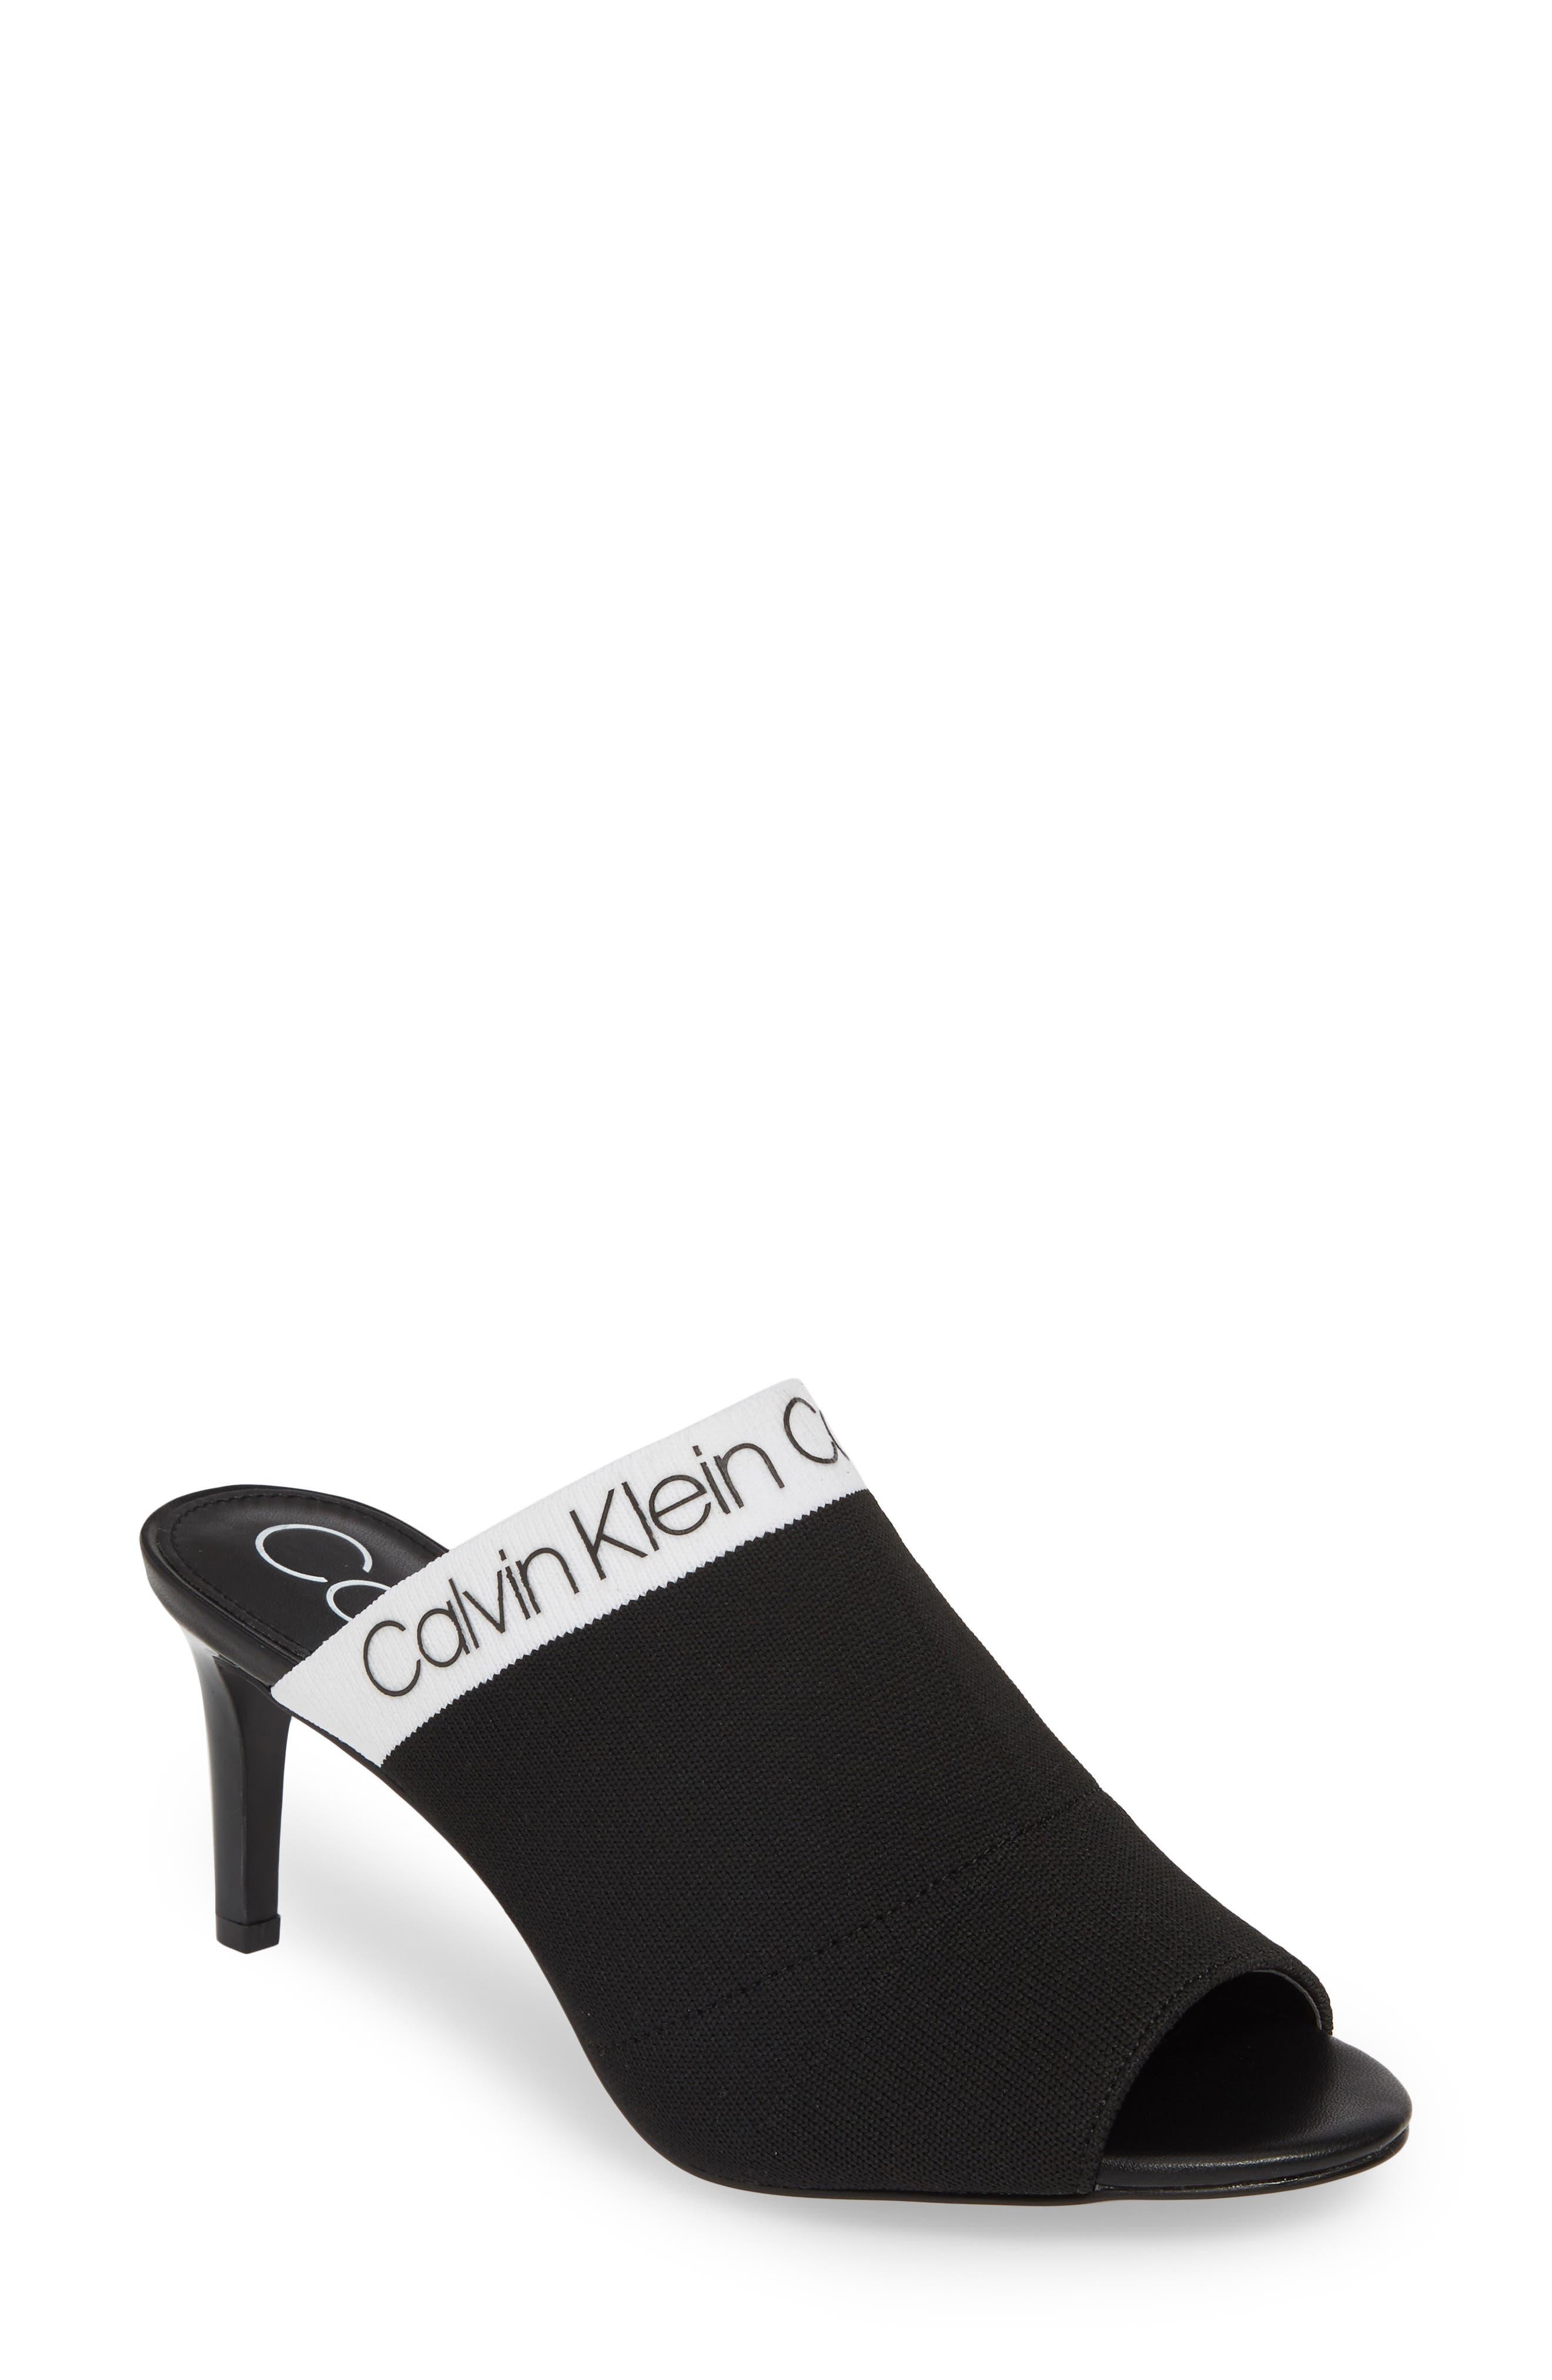 Calvin Klein Coraline Peep Toe Knit Mule- Black